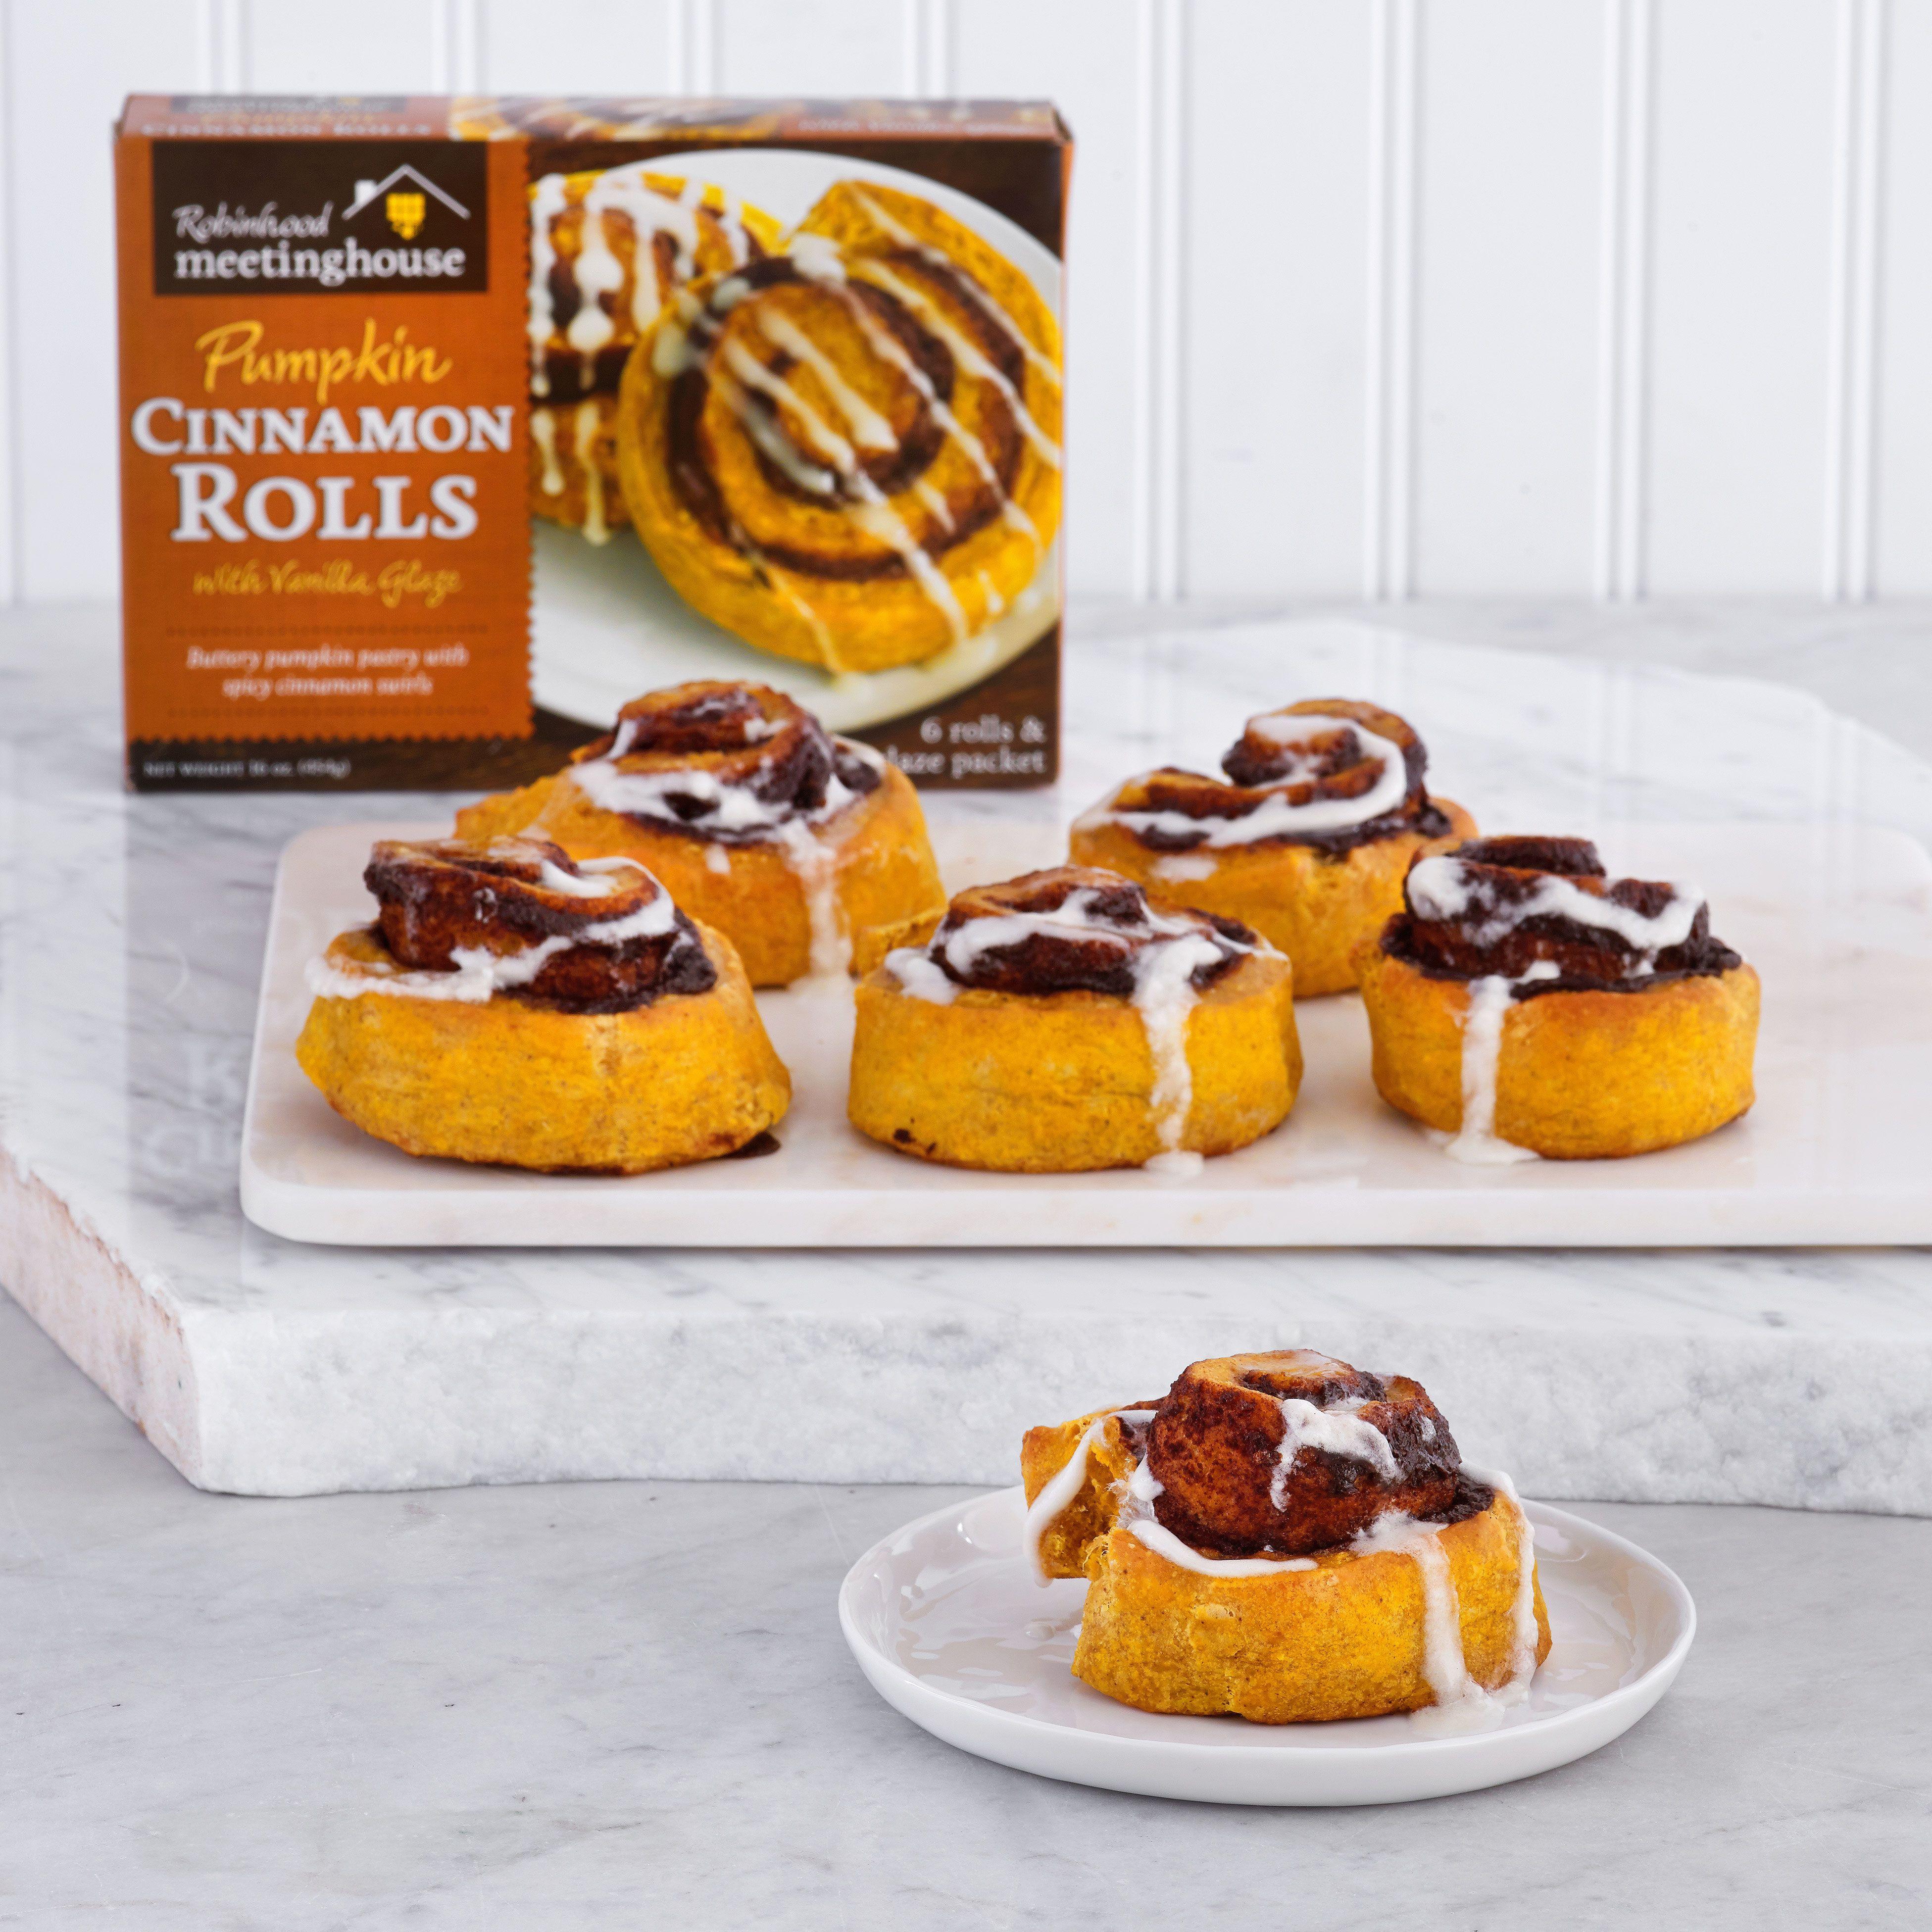 Pumpkin Cinnamon Rolls Robinhood Meetinghouse / Dean